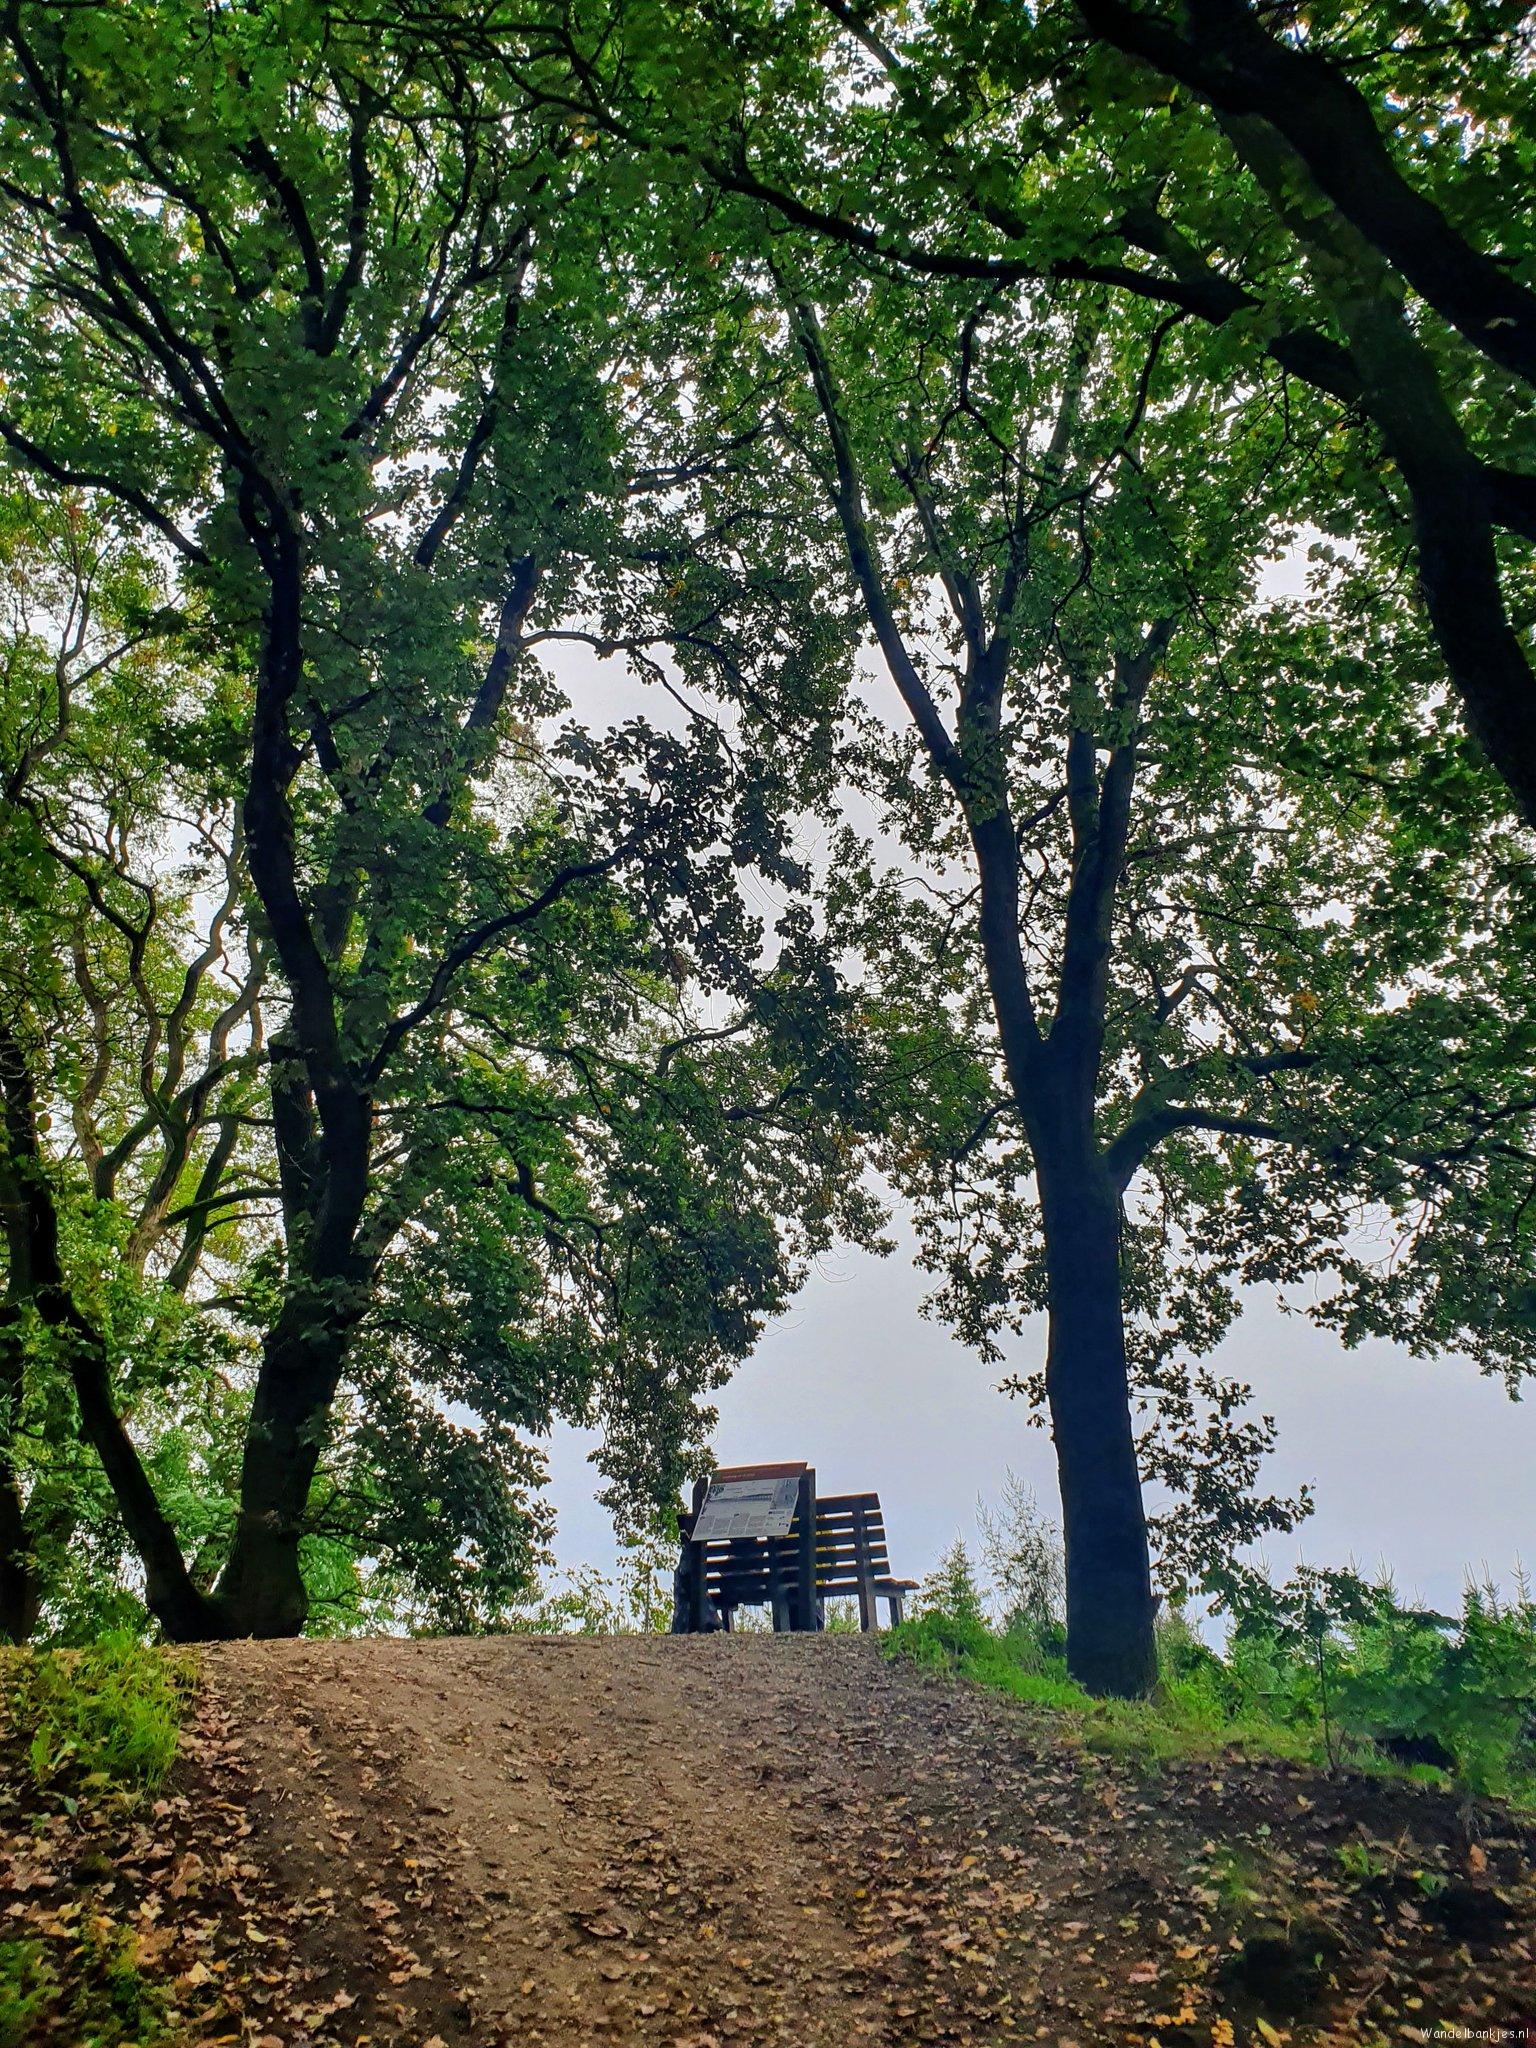 rt-wolfswandelplan-groesbeek-wandelbankjes-https-t-co-x39gb64ua1